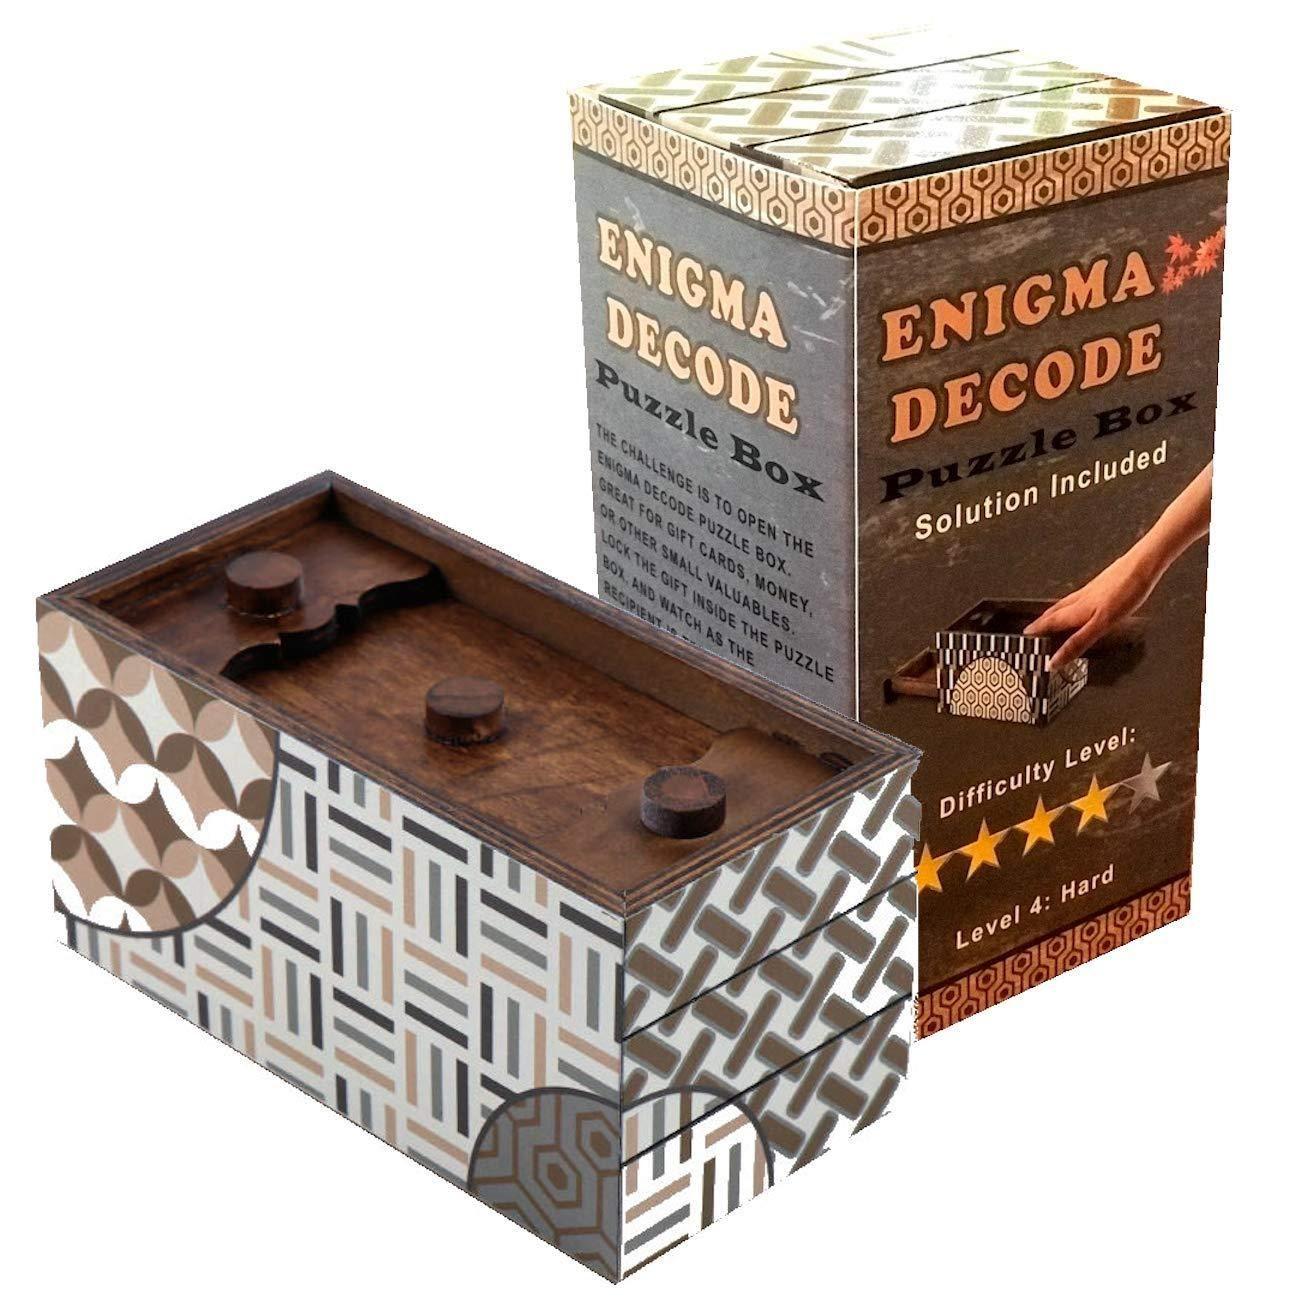 Enigma decode secret puzzle box with images puzzle box